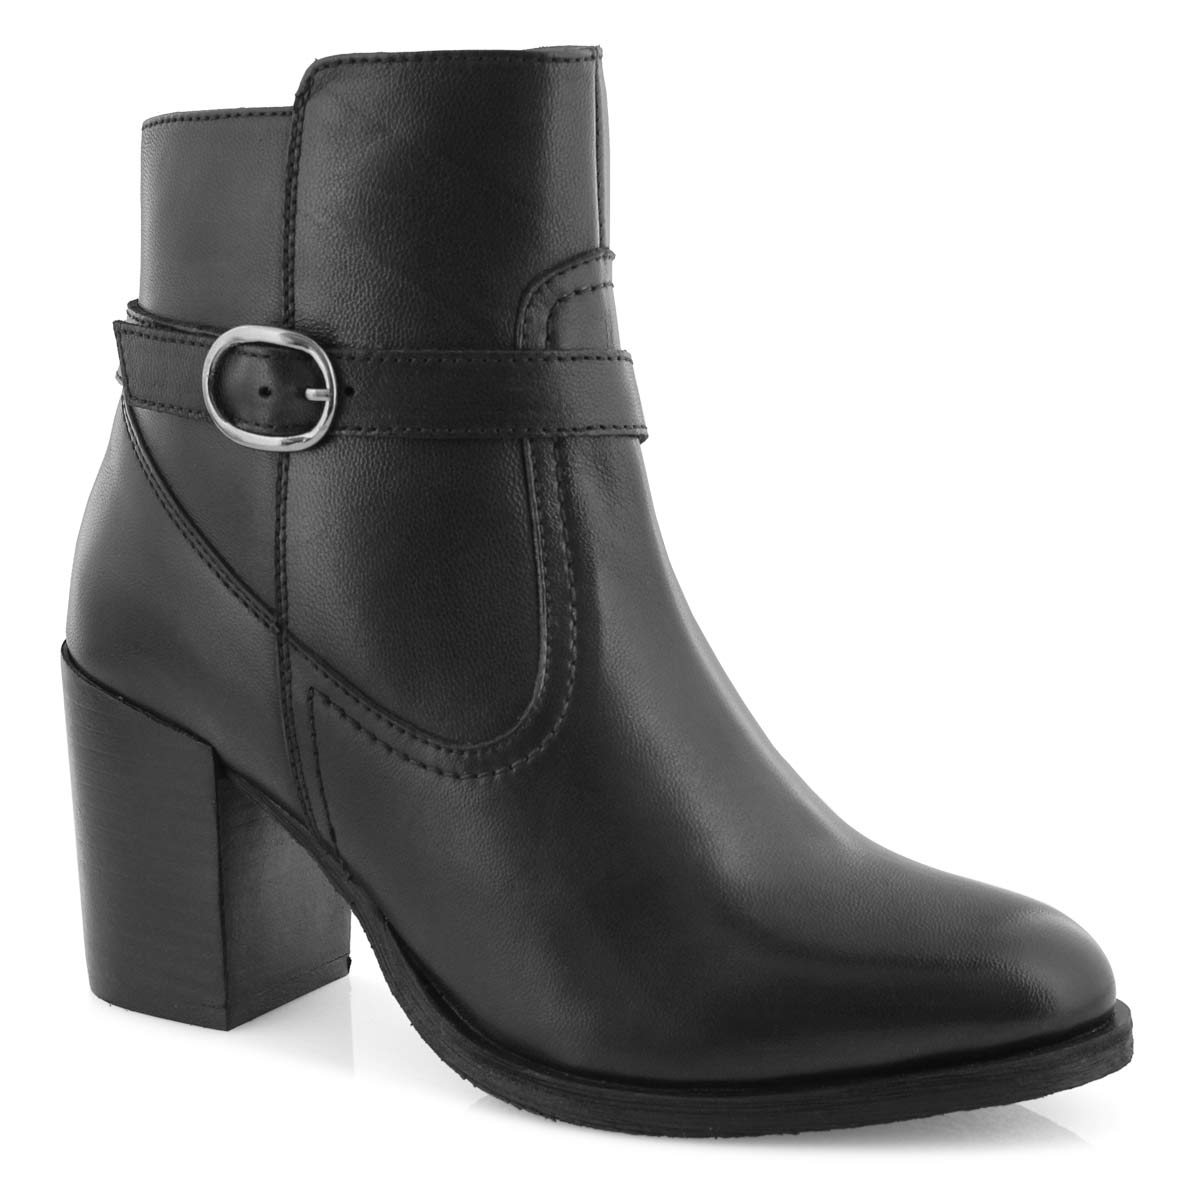 Women's DOMINA black ankle booties